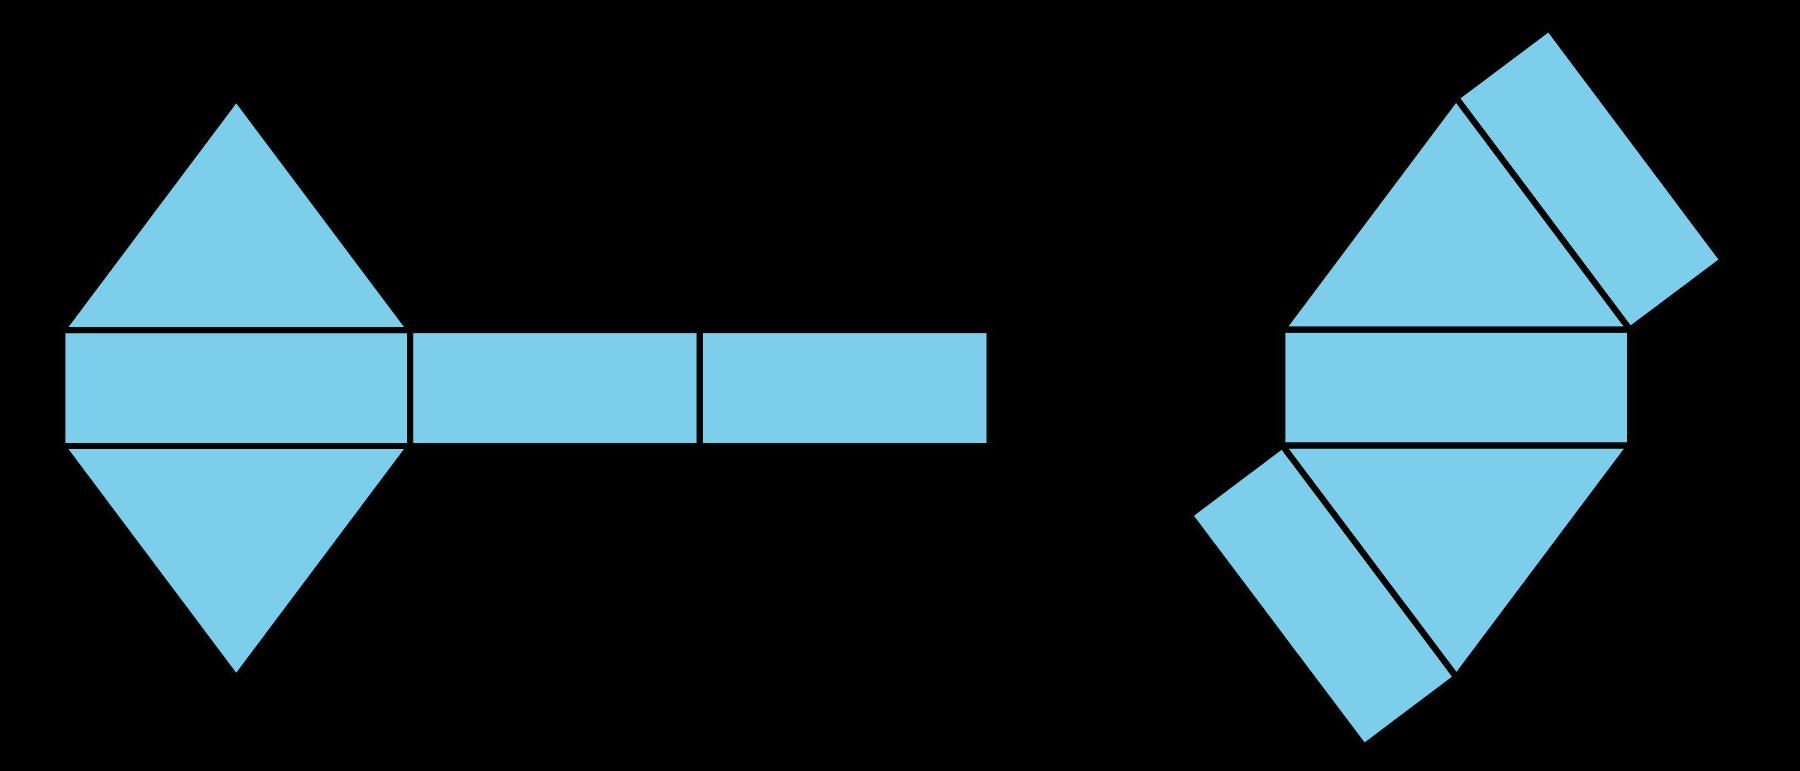 Cube clipart congruent. Grade unit practice problems